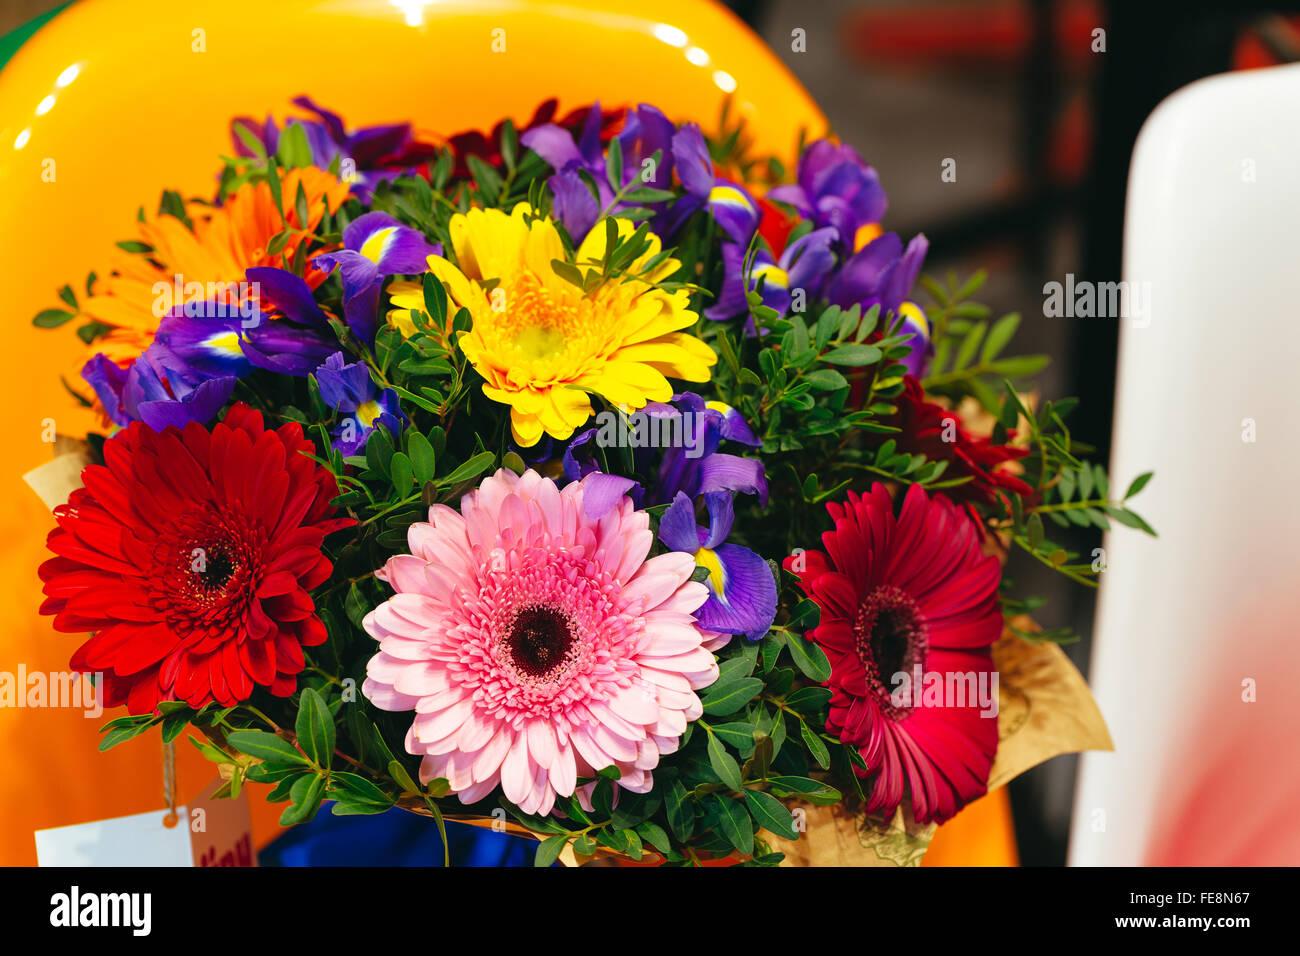 Flowers bouquet of gerbera, iris, pistacia on coloroful background - Stock Image